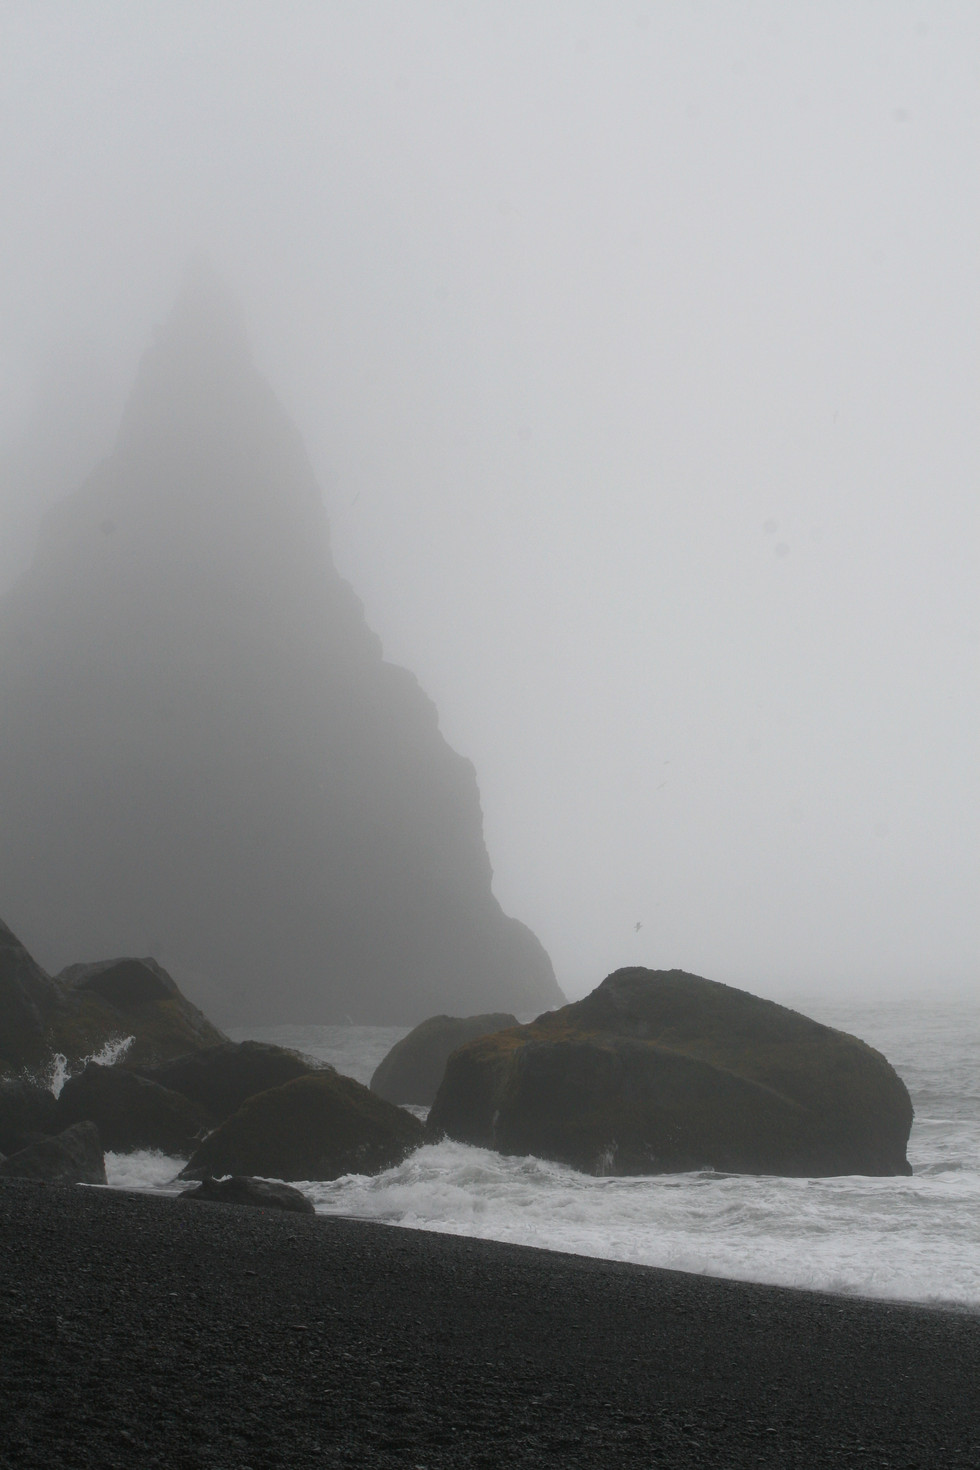 Iceland Black Sand Beach 1.jpg